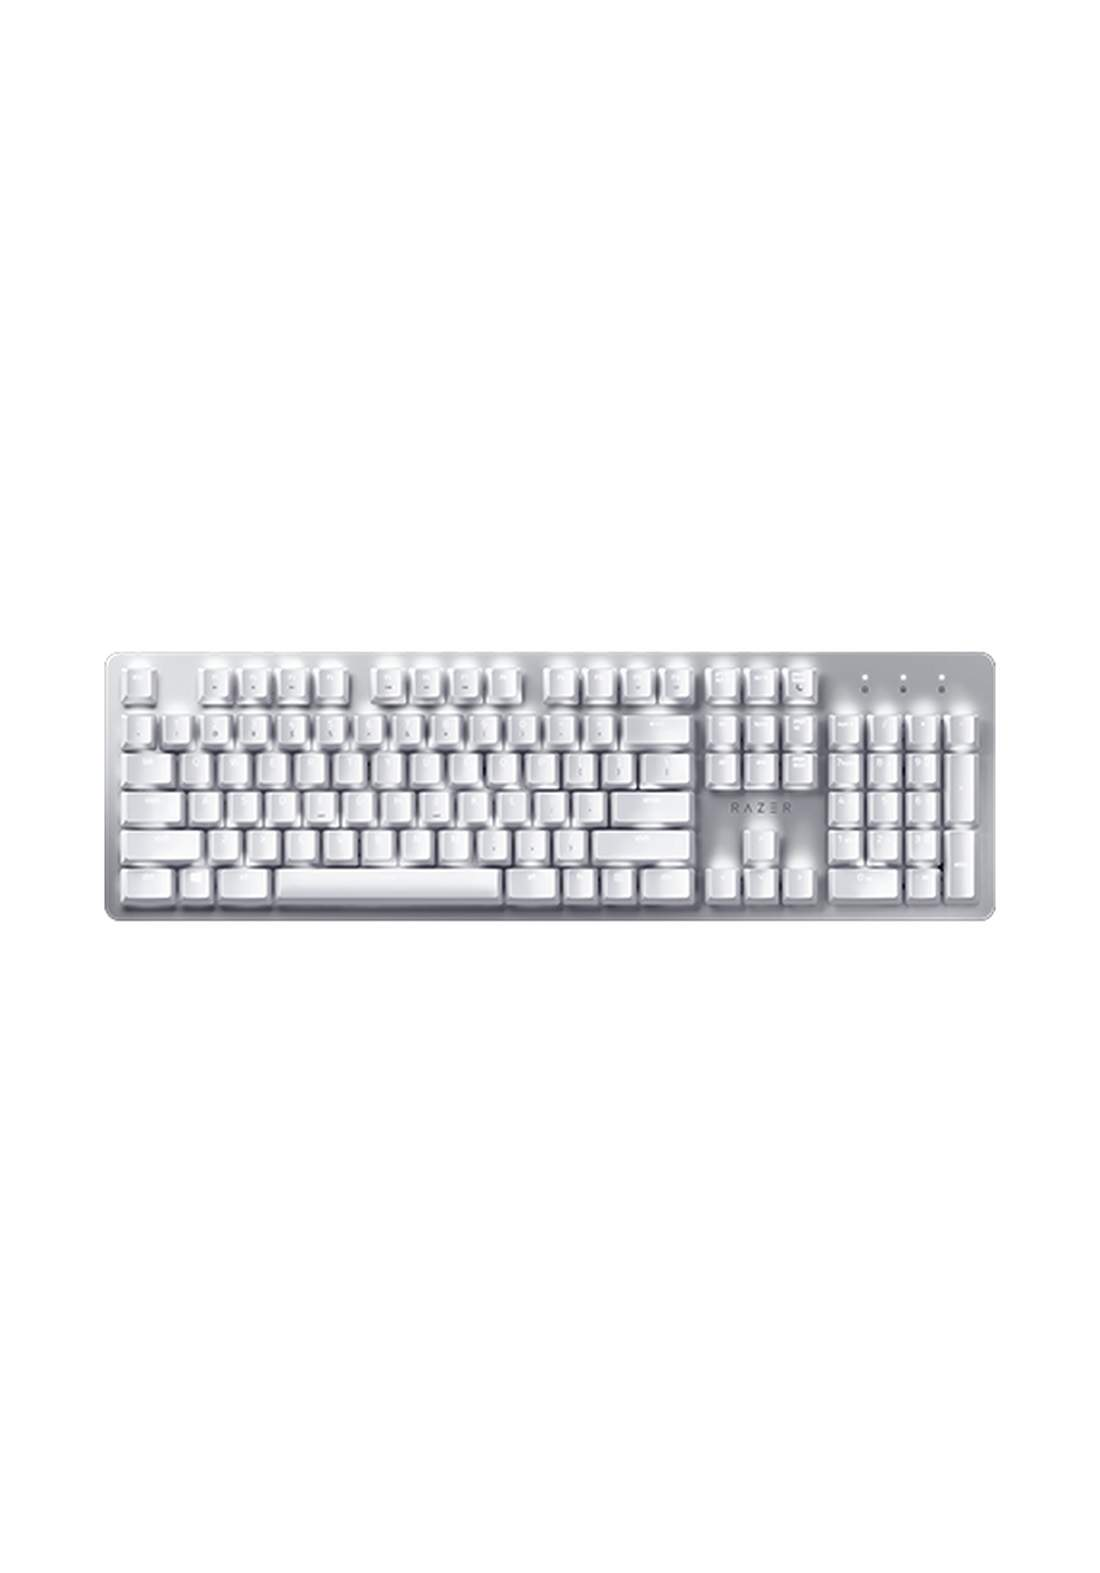 Razer Pro Wireless Productivity Mechanical Keyboard - White كيبورد